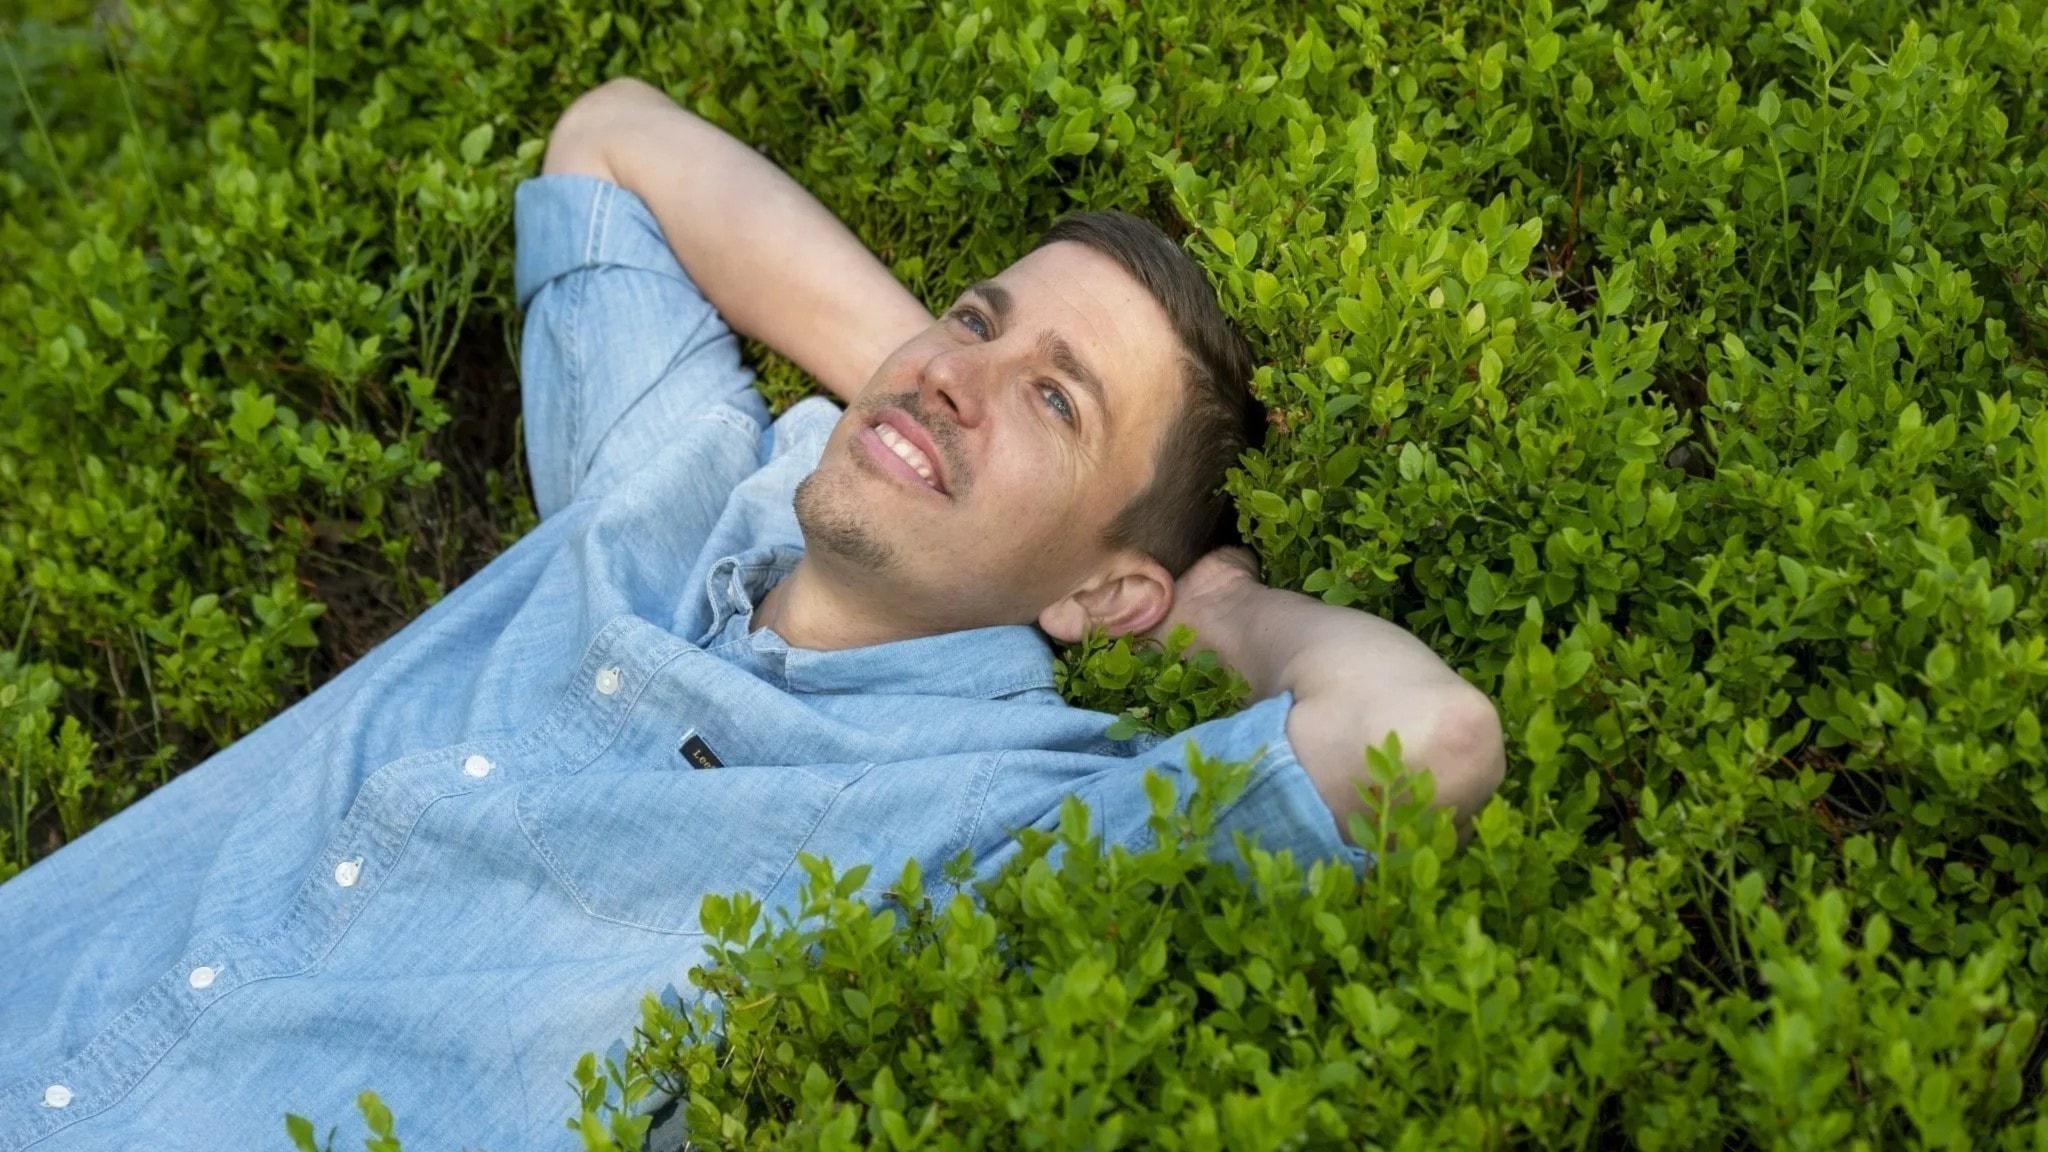 Programledaren Lars Svan ligger i gröngräset